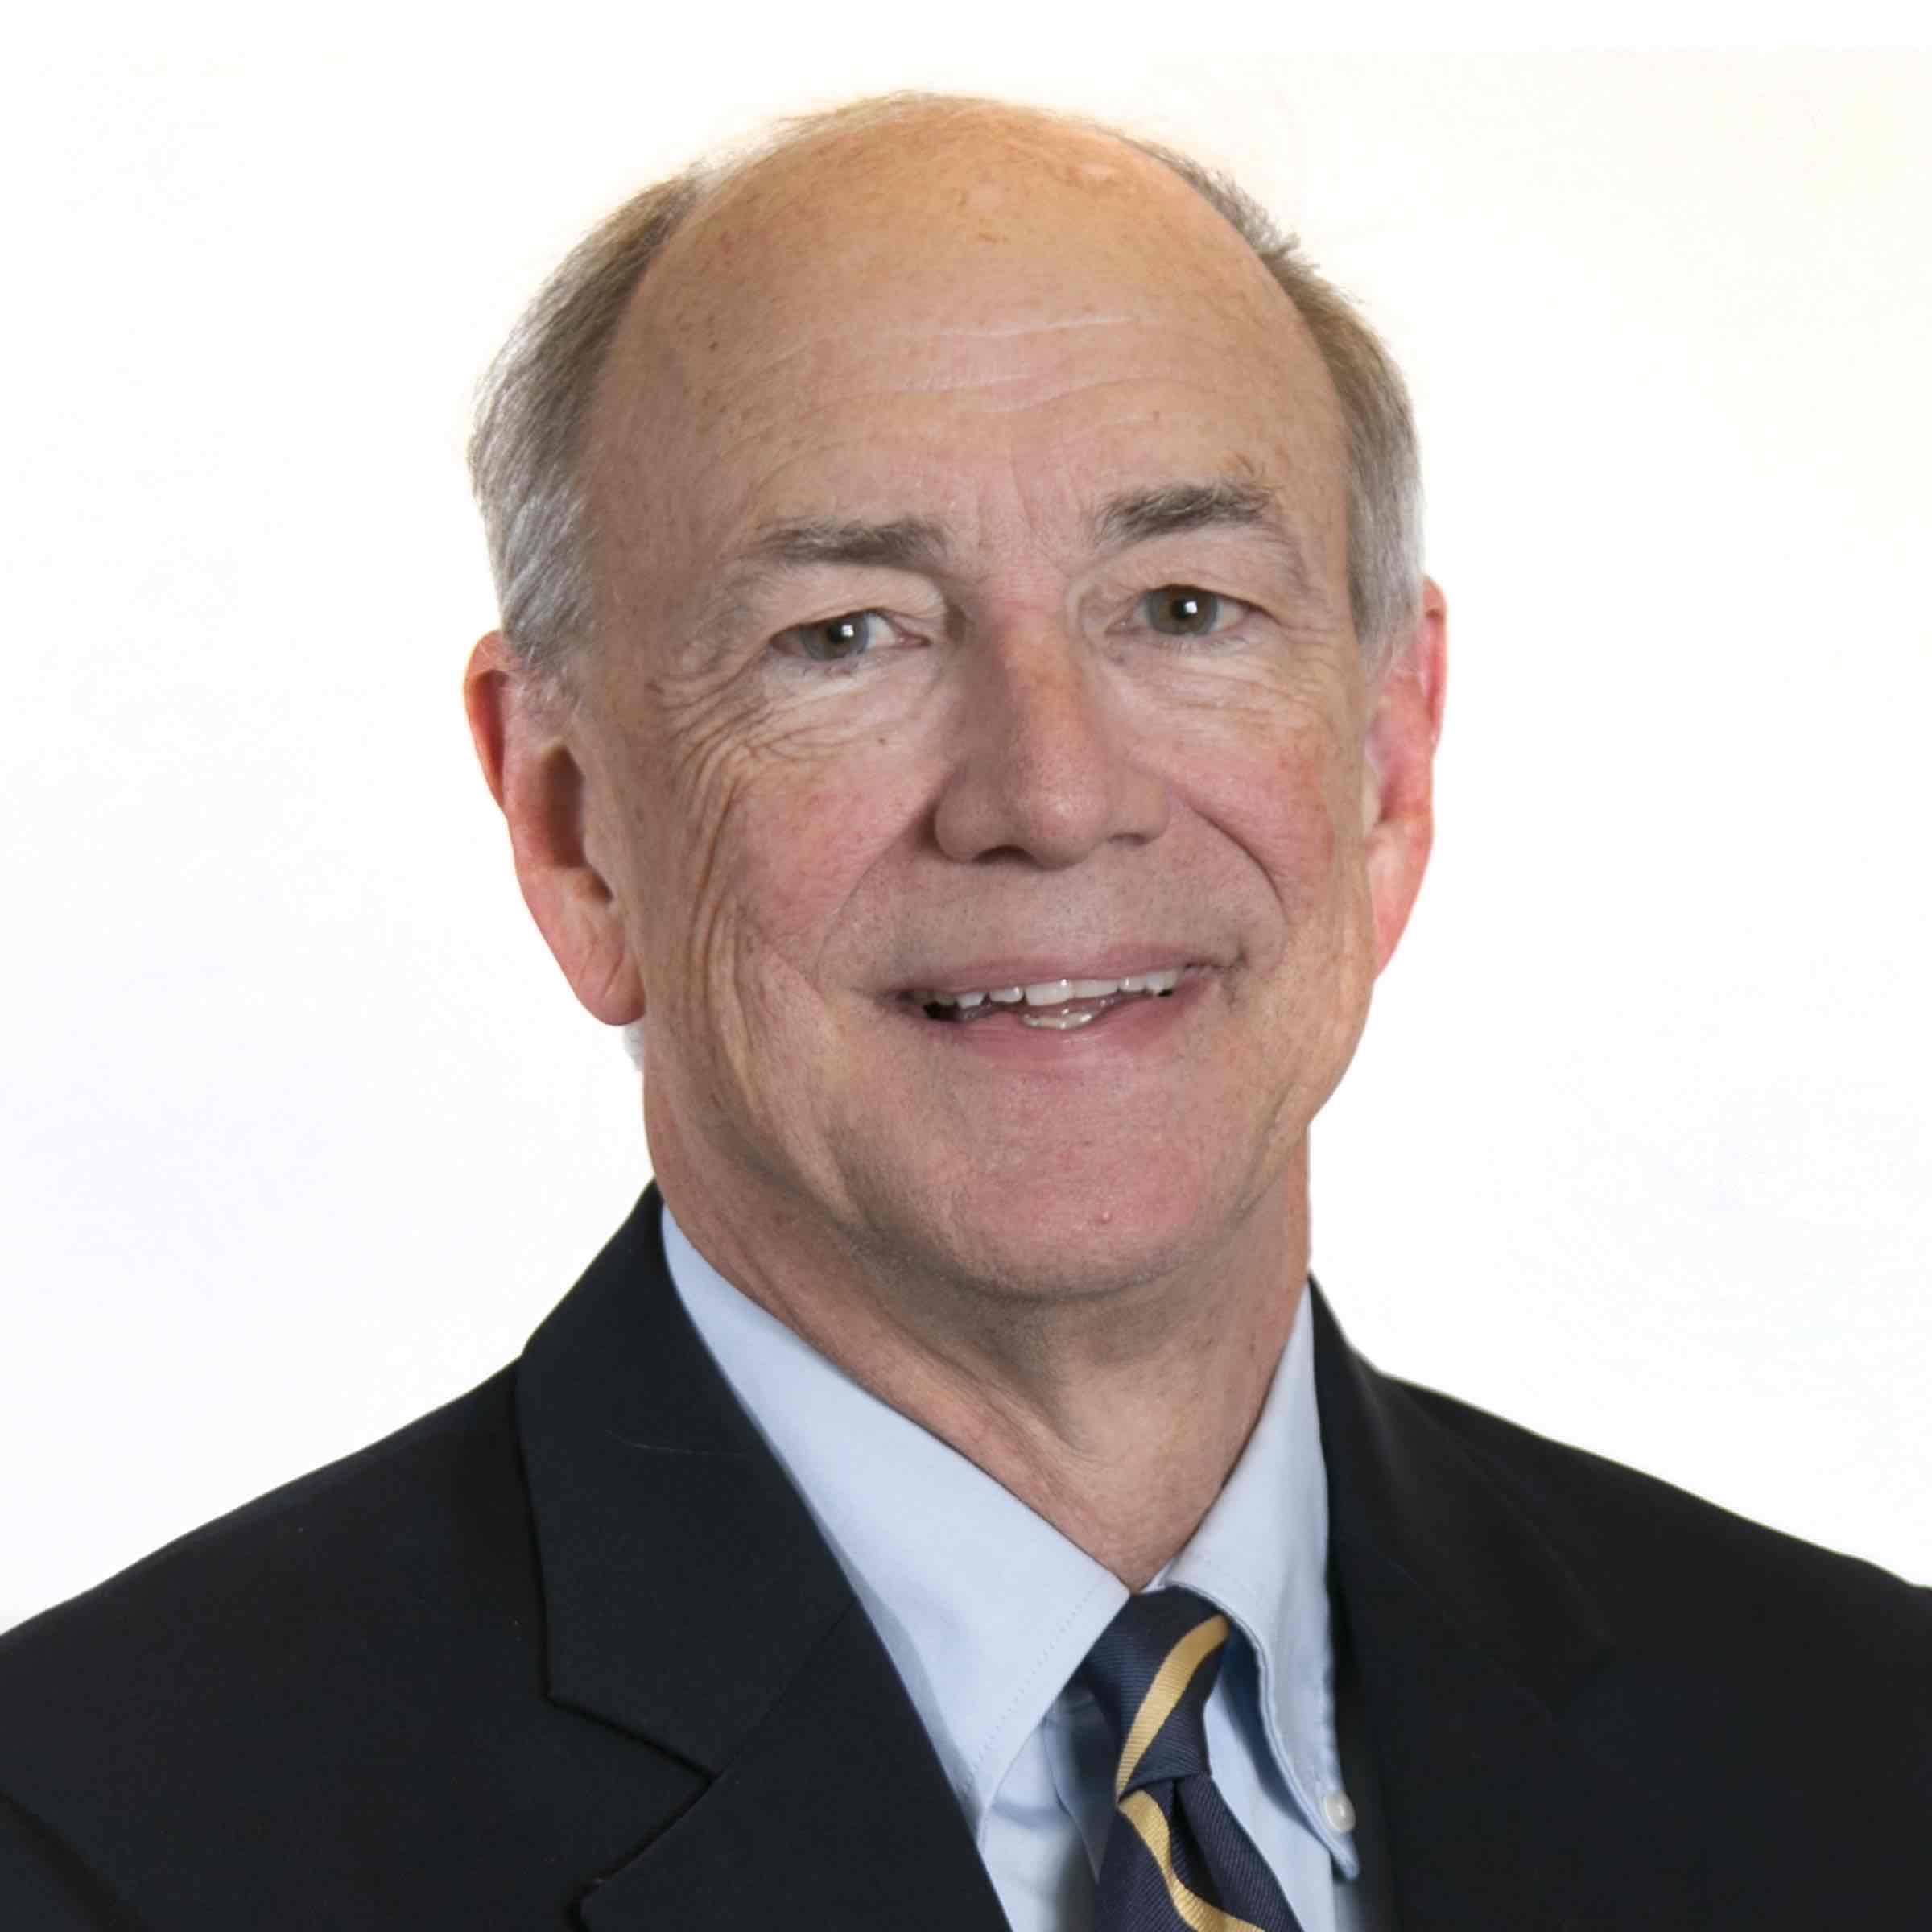 A photo of Senior Partner, Walter Kelley, Bankruptcy Trustee